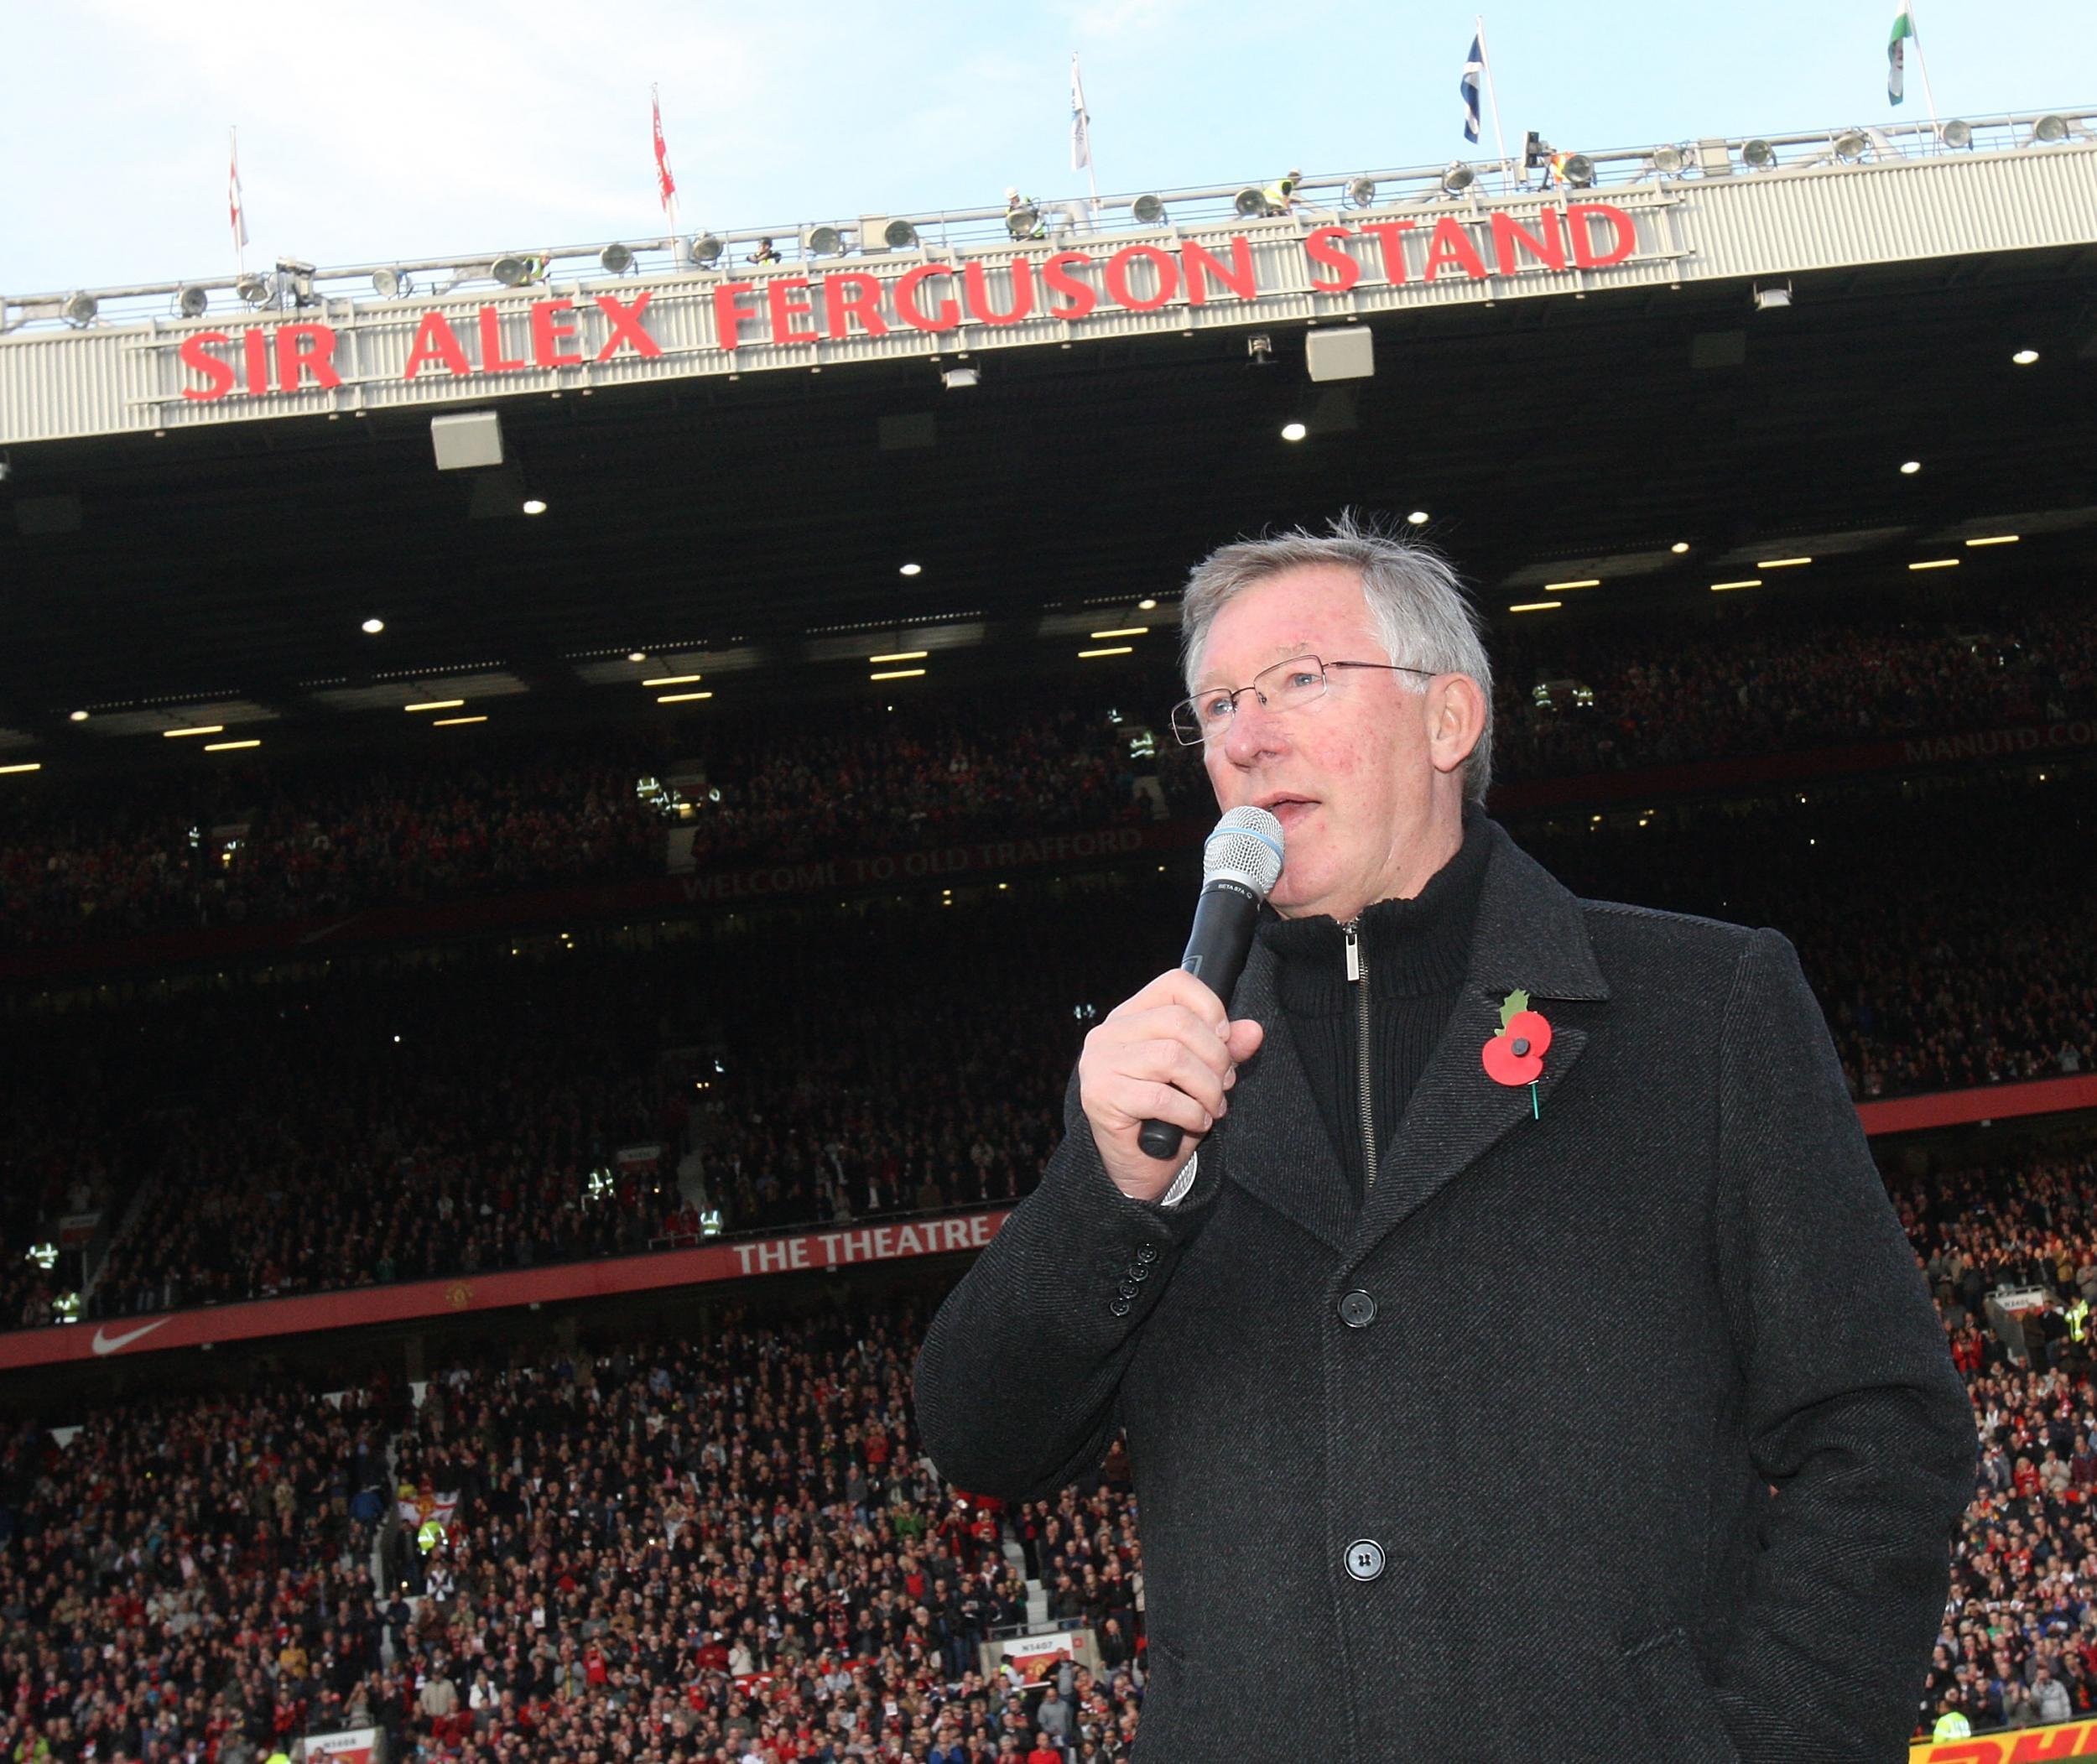 Sir Alex Ferguson: Football world rallies around former Manchester United manager after brain haemorrhage